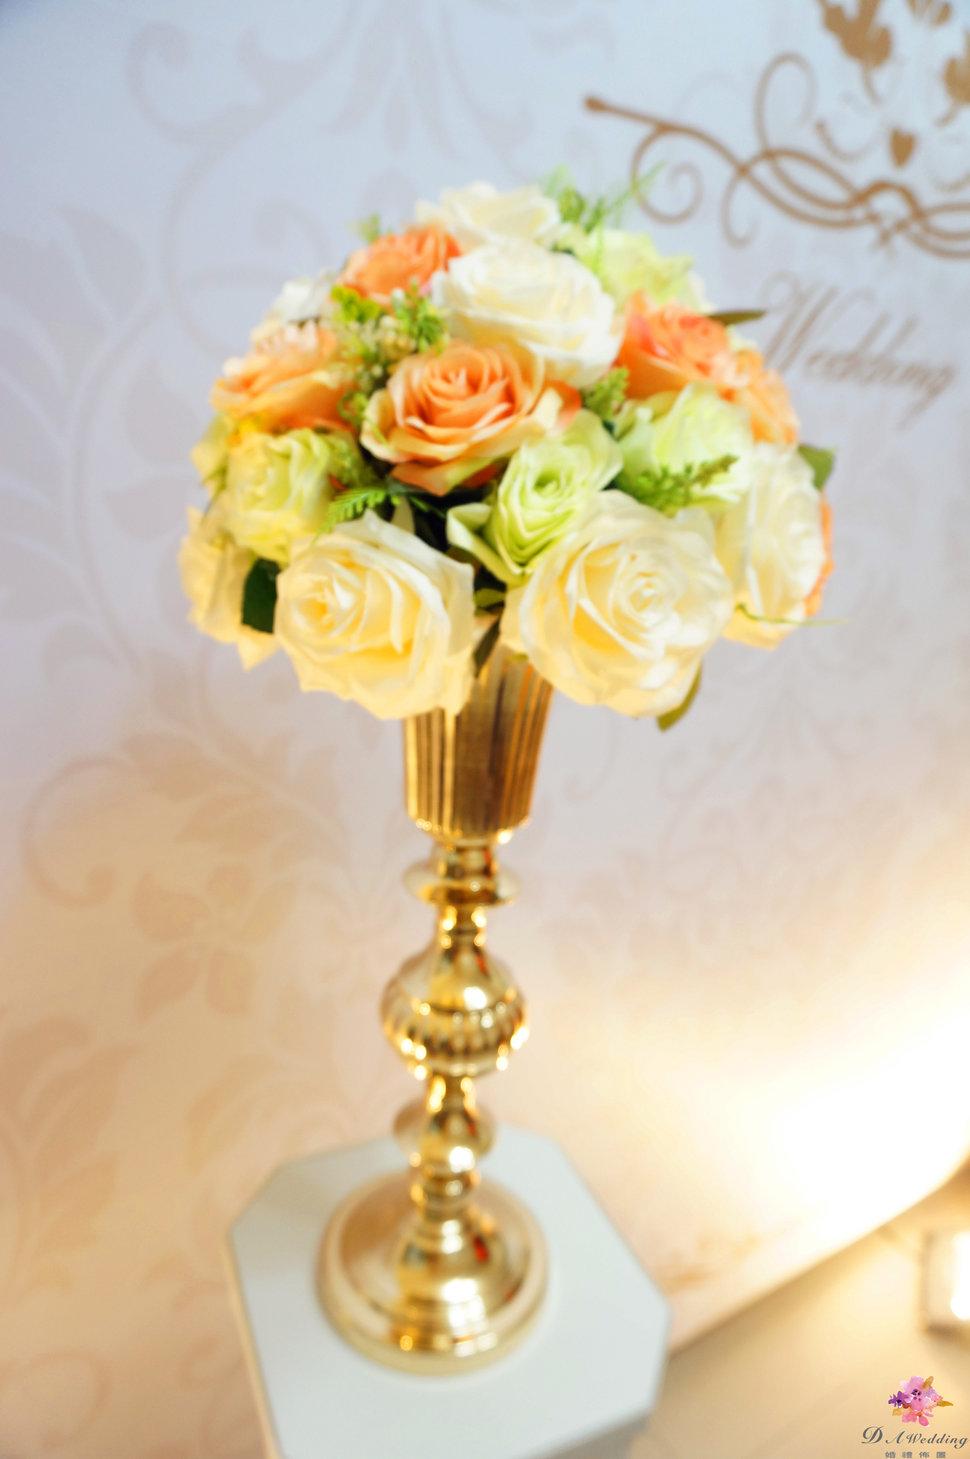 DSC01120 - 小夫妻婚禮佈置&婚禮主持人《結婚吧》